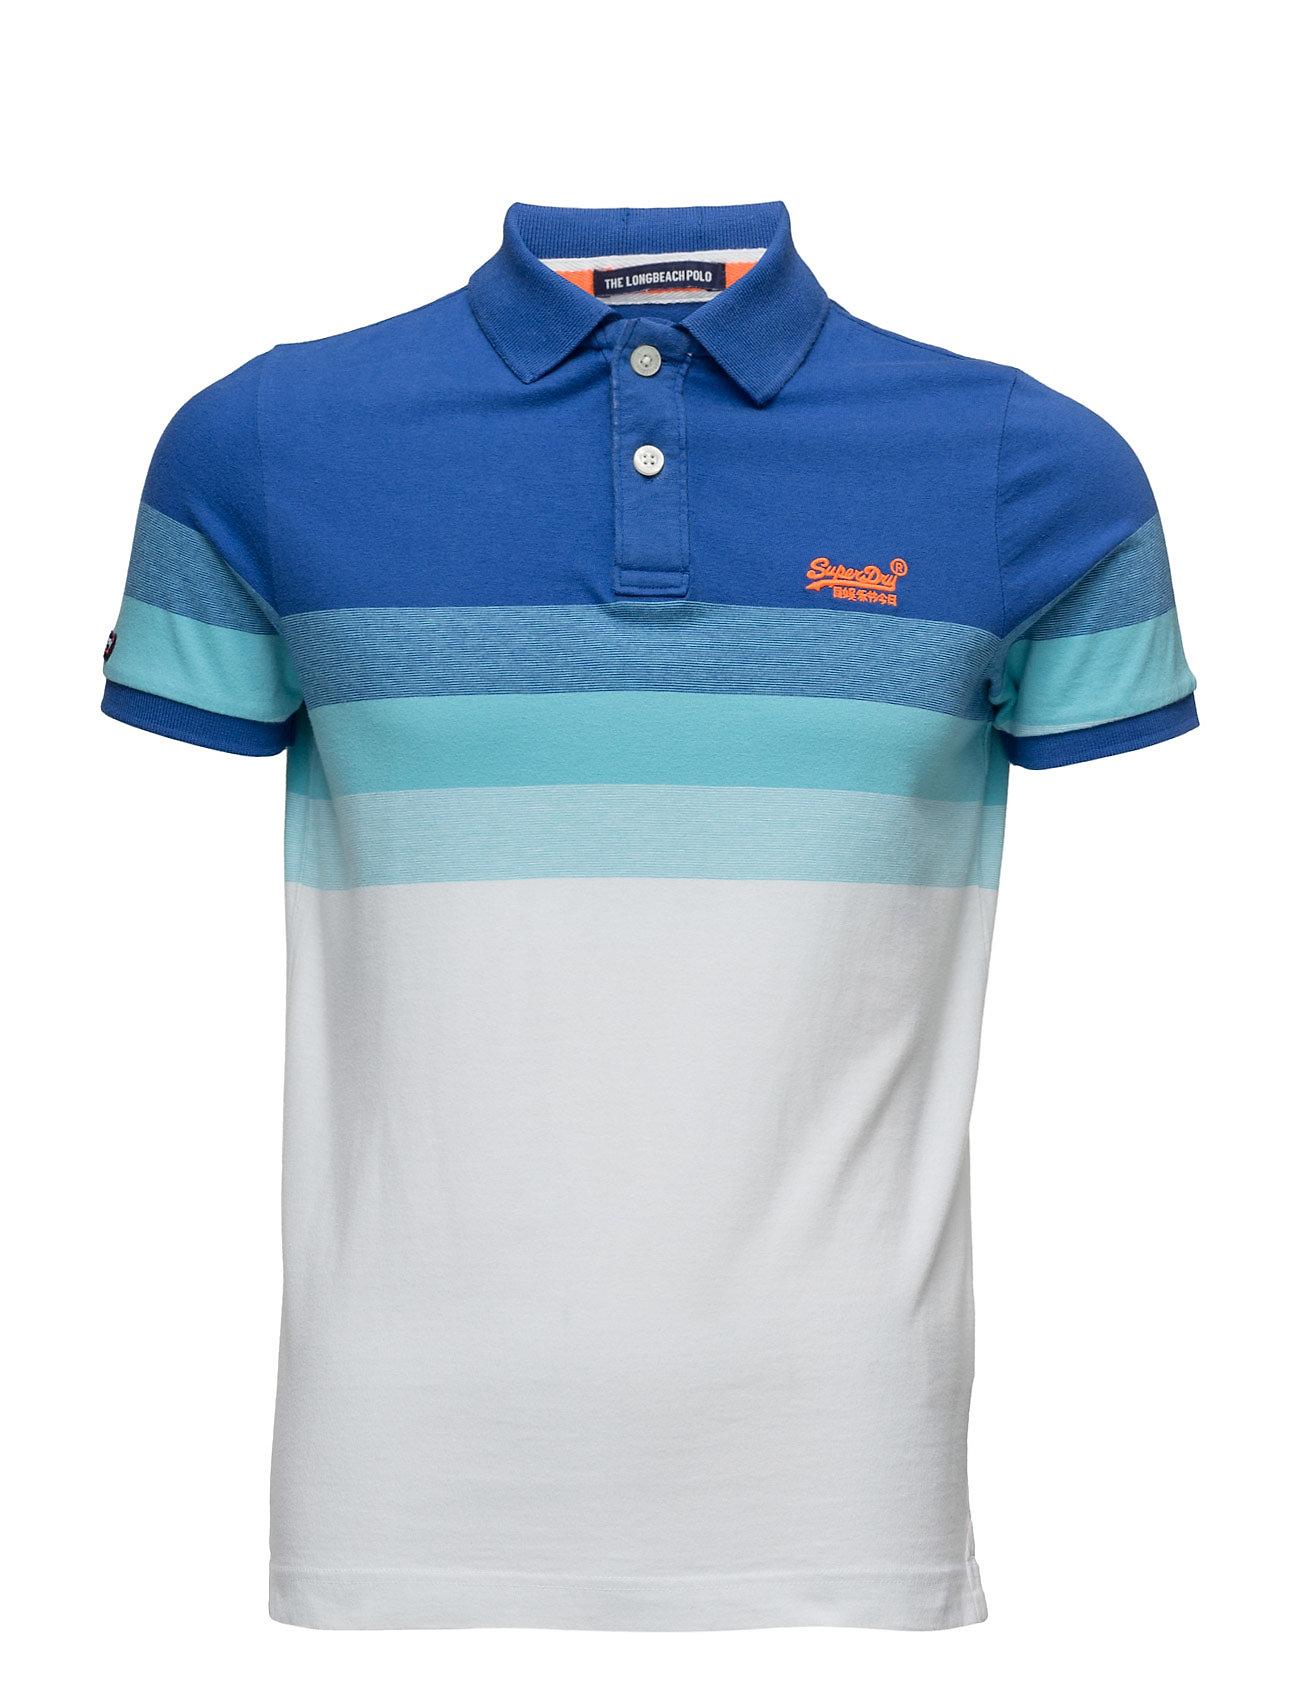 Longbeach Polo Superdry Kortærmede polo t-shirts til Herrer i Blå